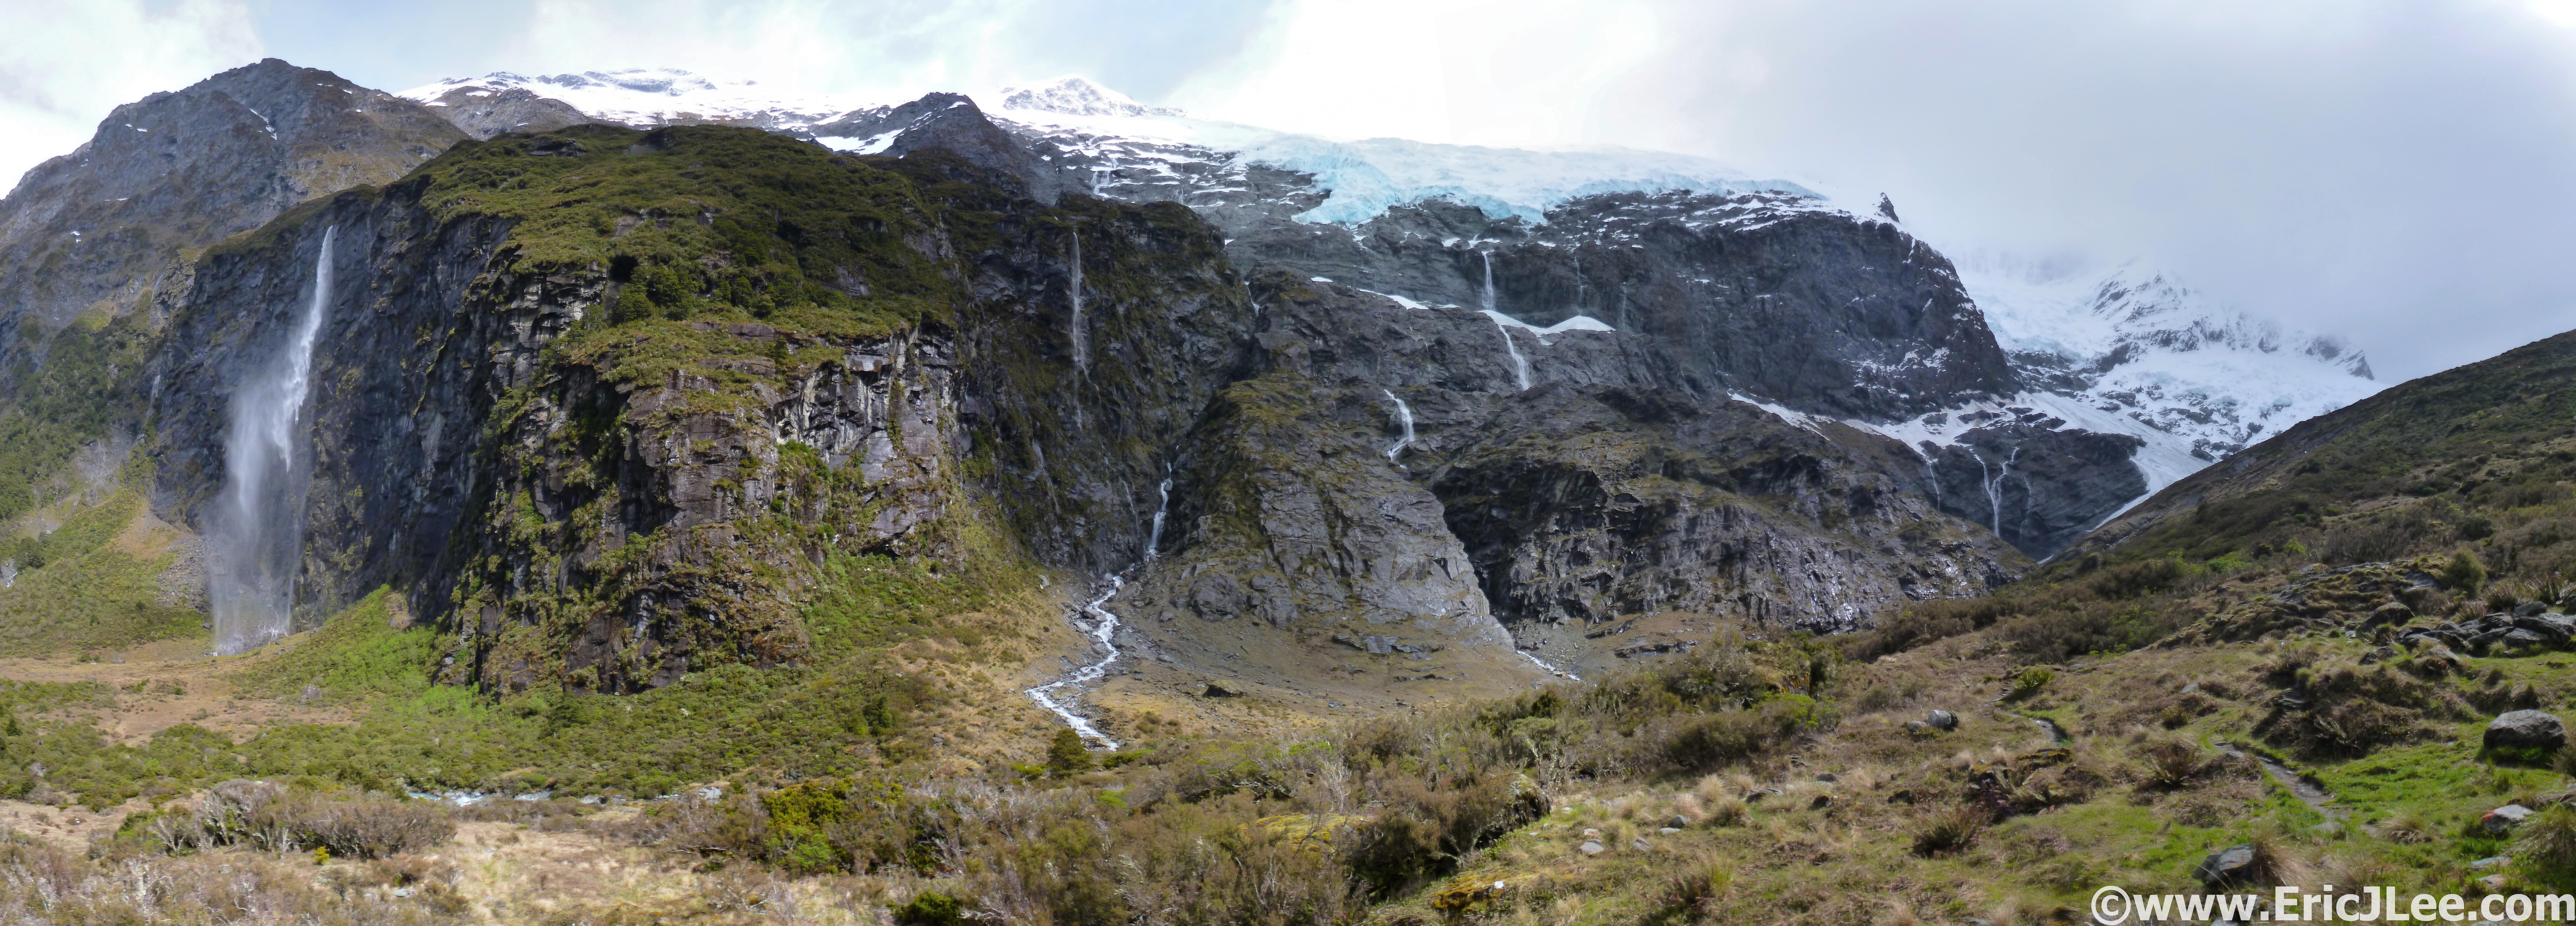 Thunder Creek Falls Mt Aspiring National Park New Zealand The Water In Nz